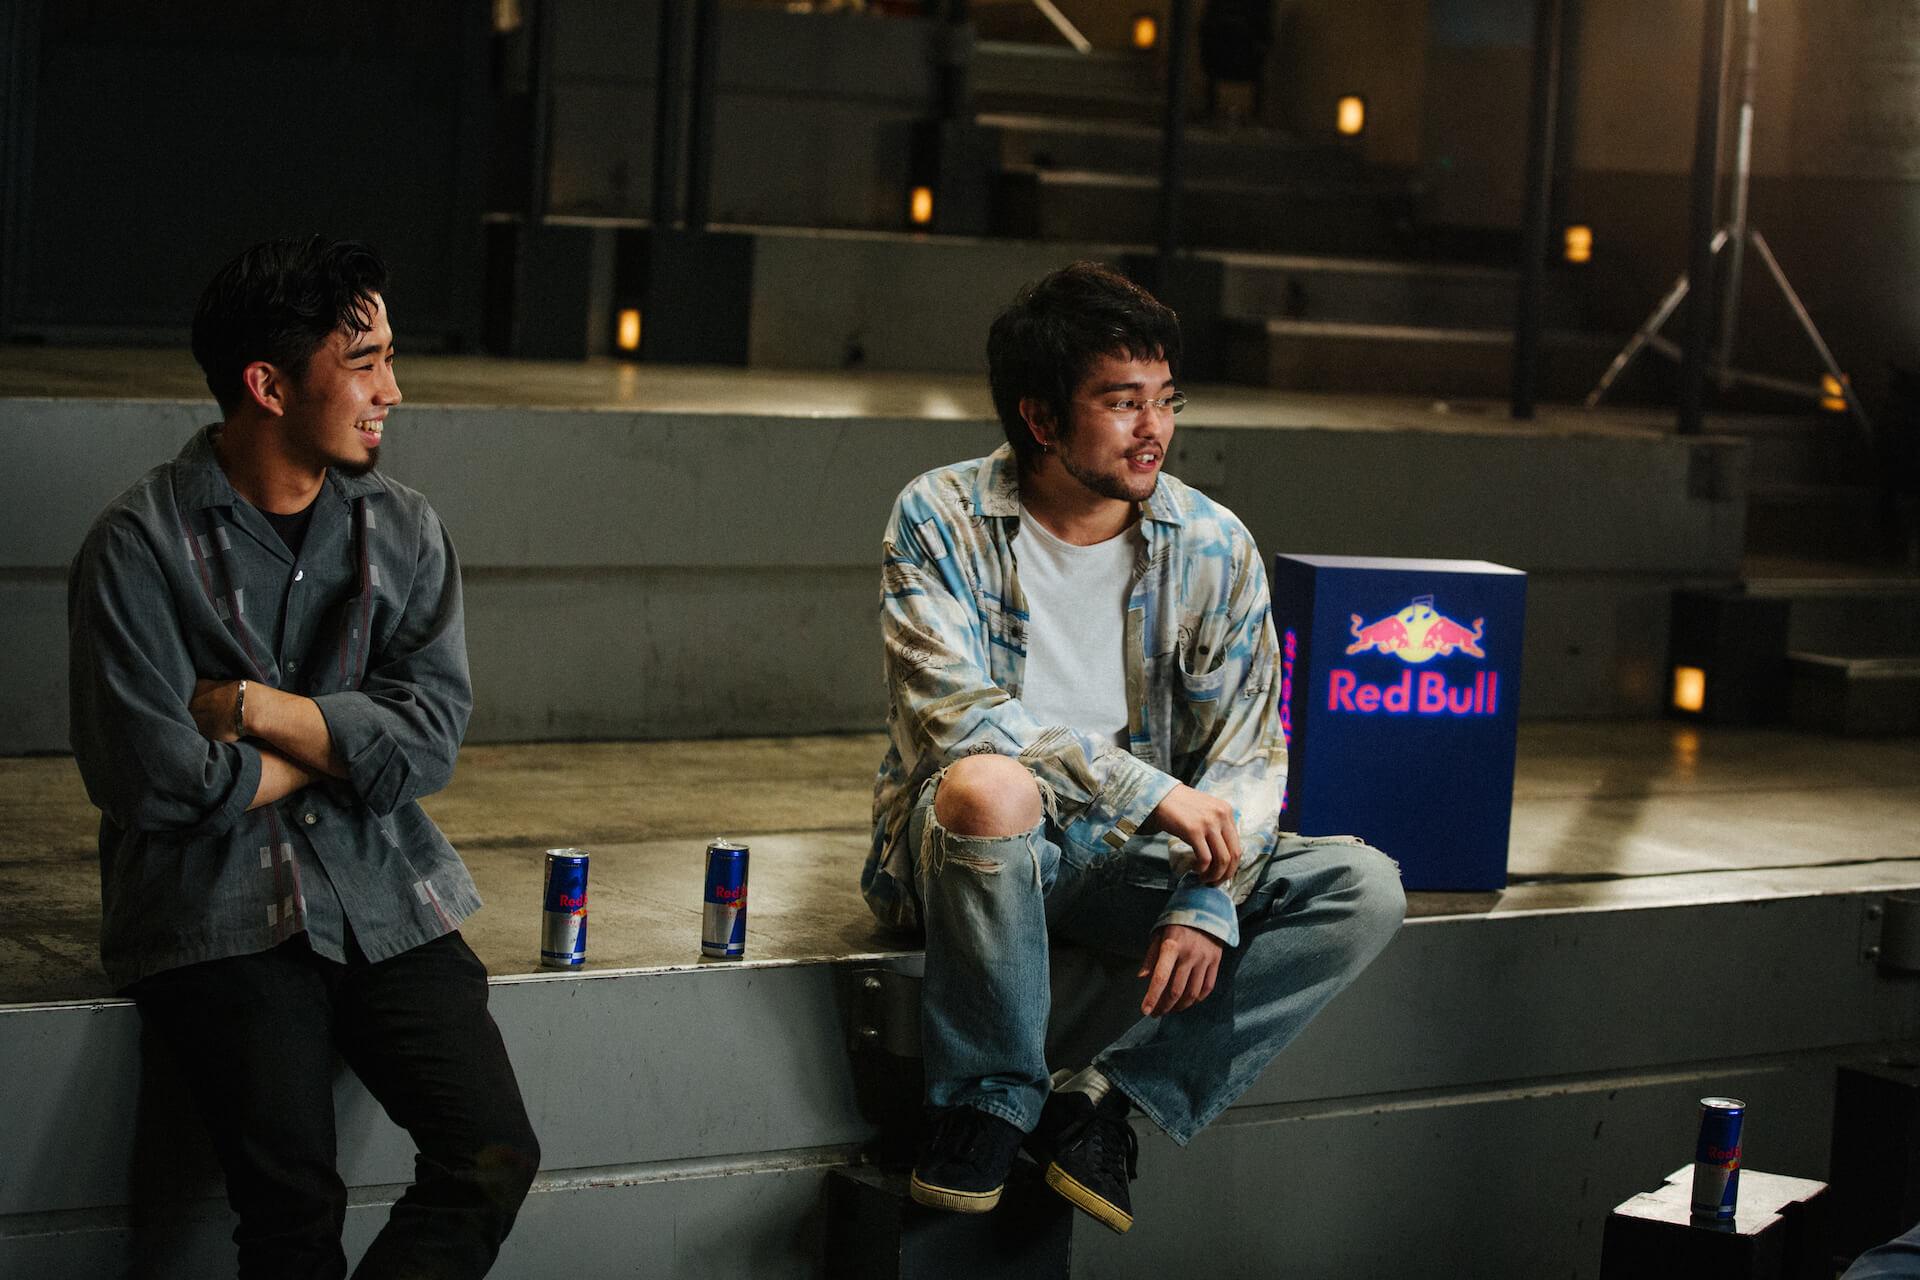 "King Gnuが日本アーティスト史上初めてRed Bullとパートナーシップを締結!""Go Louder""プロジェクトでインタビュー公開&コラボグッズプレゼントも music200908_kinggnu_redbull_17"